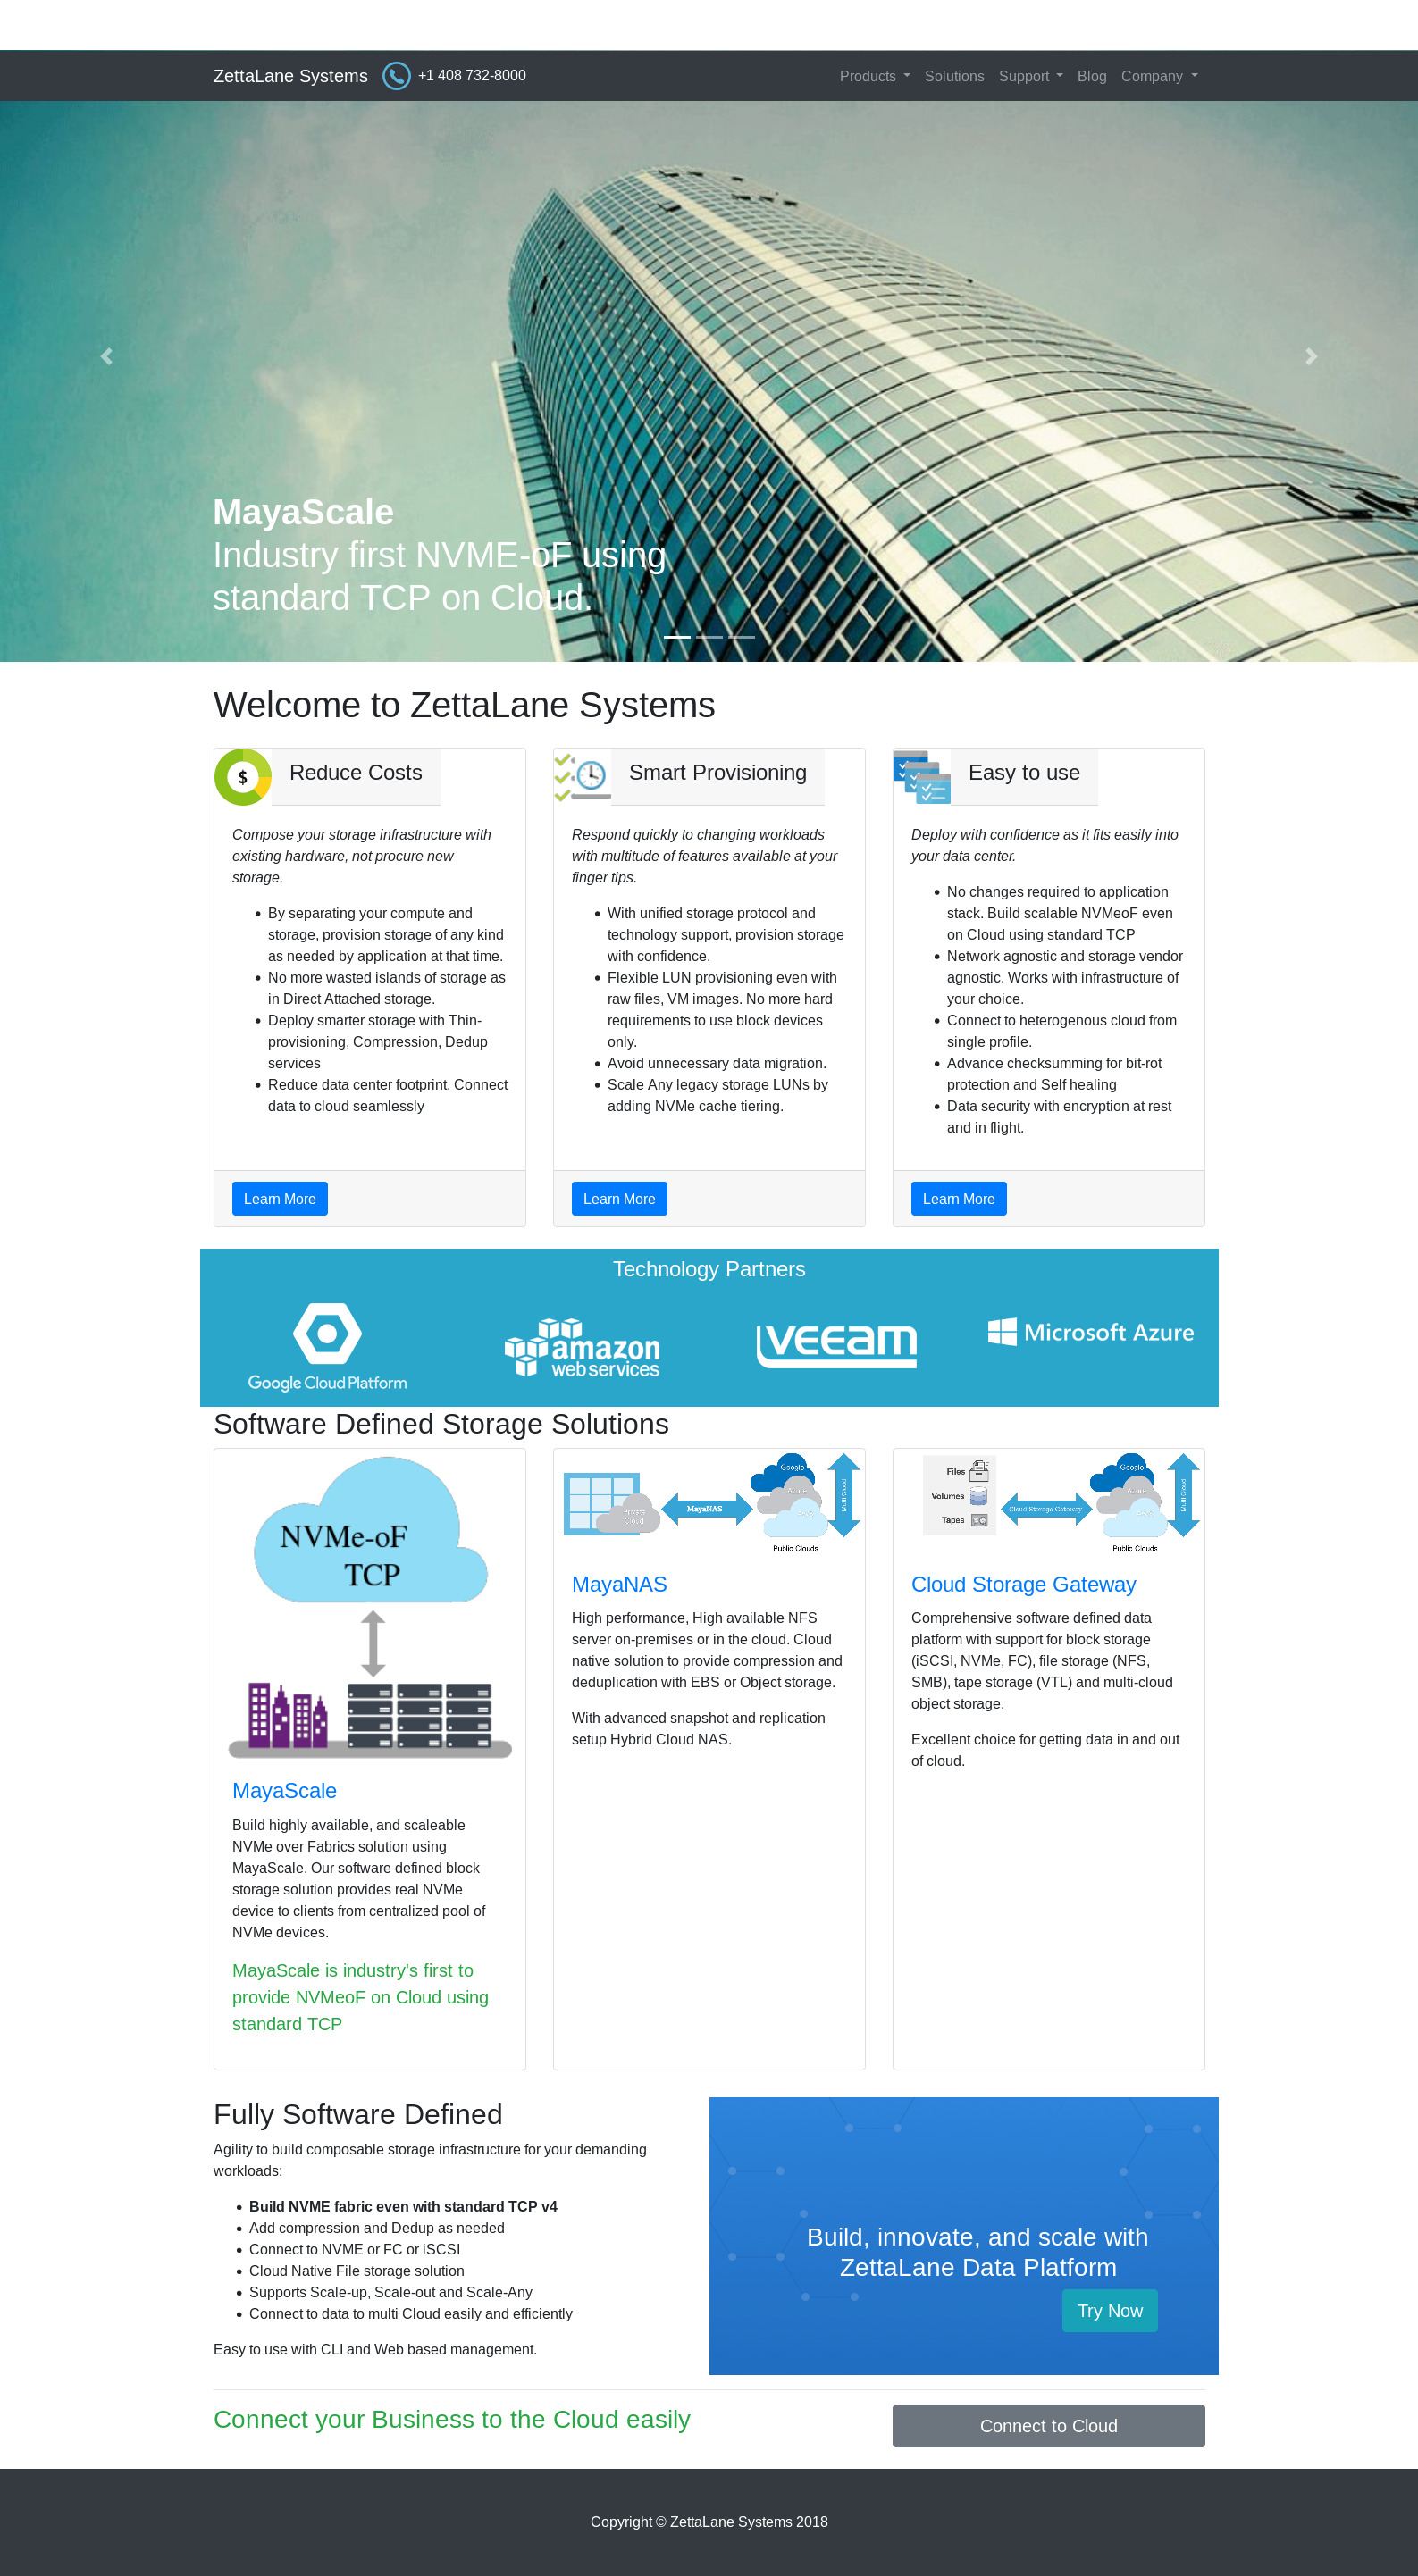 ZettaLane - Linux based Software Defined Storage Solutions